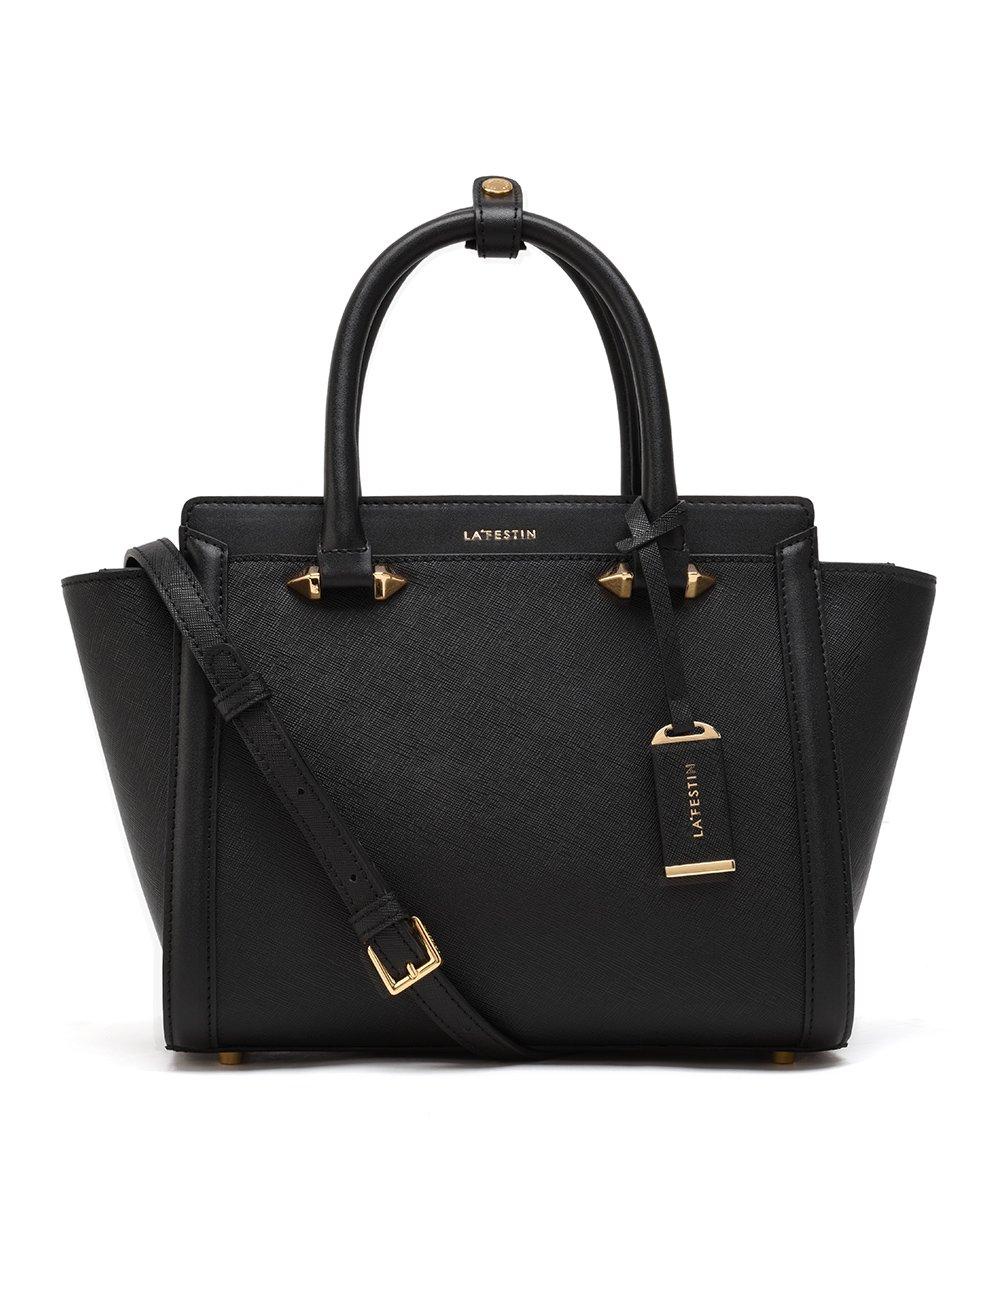 LA'FESTIN Tote Purses and Handbags for Women Black Leather Large Shoulder Bags